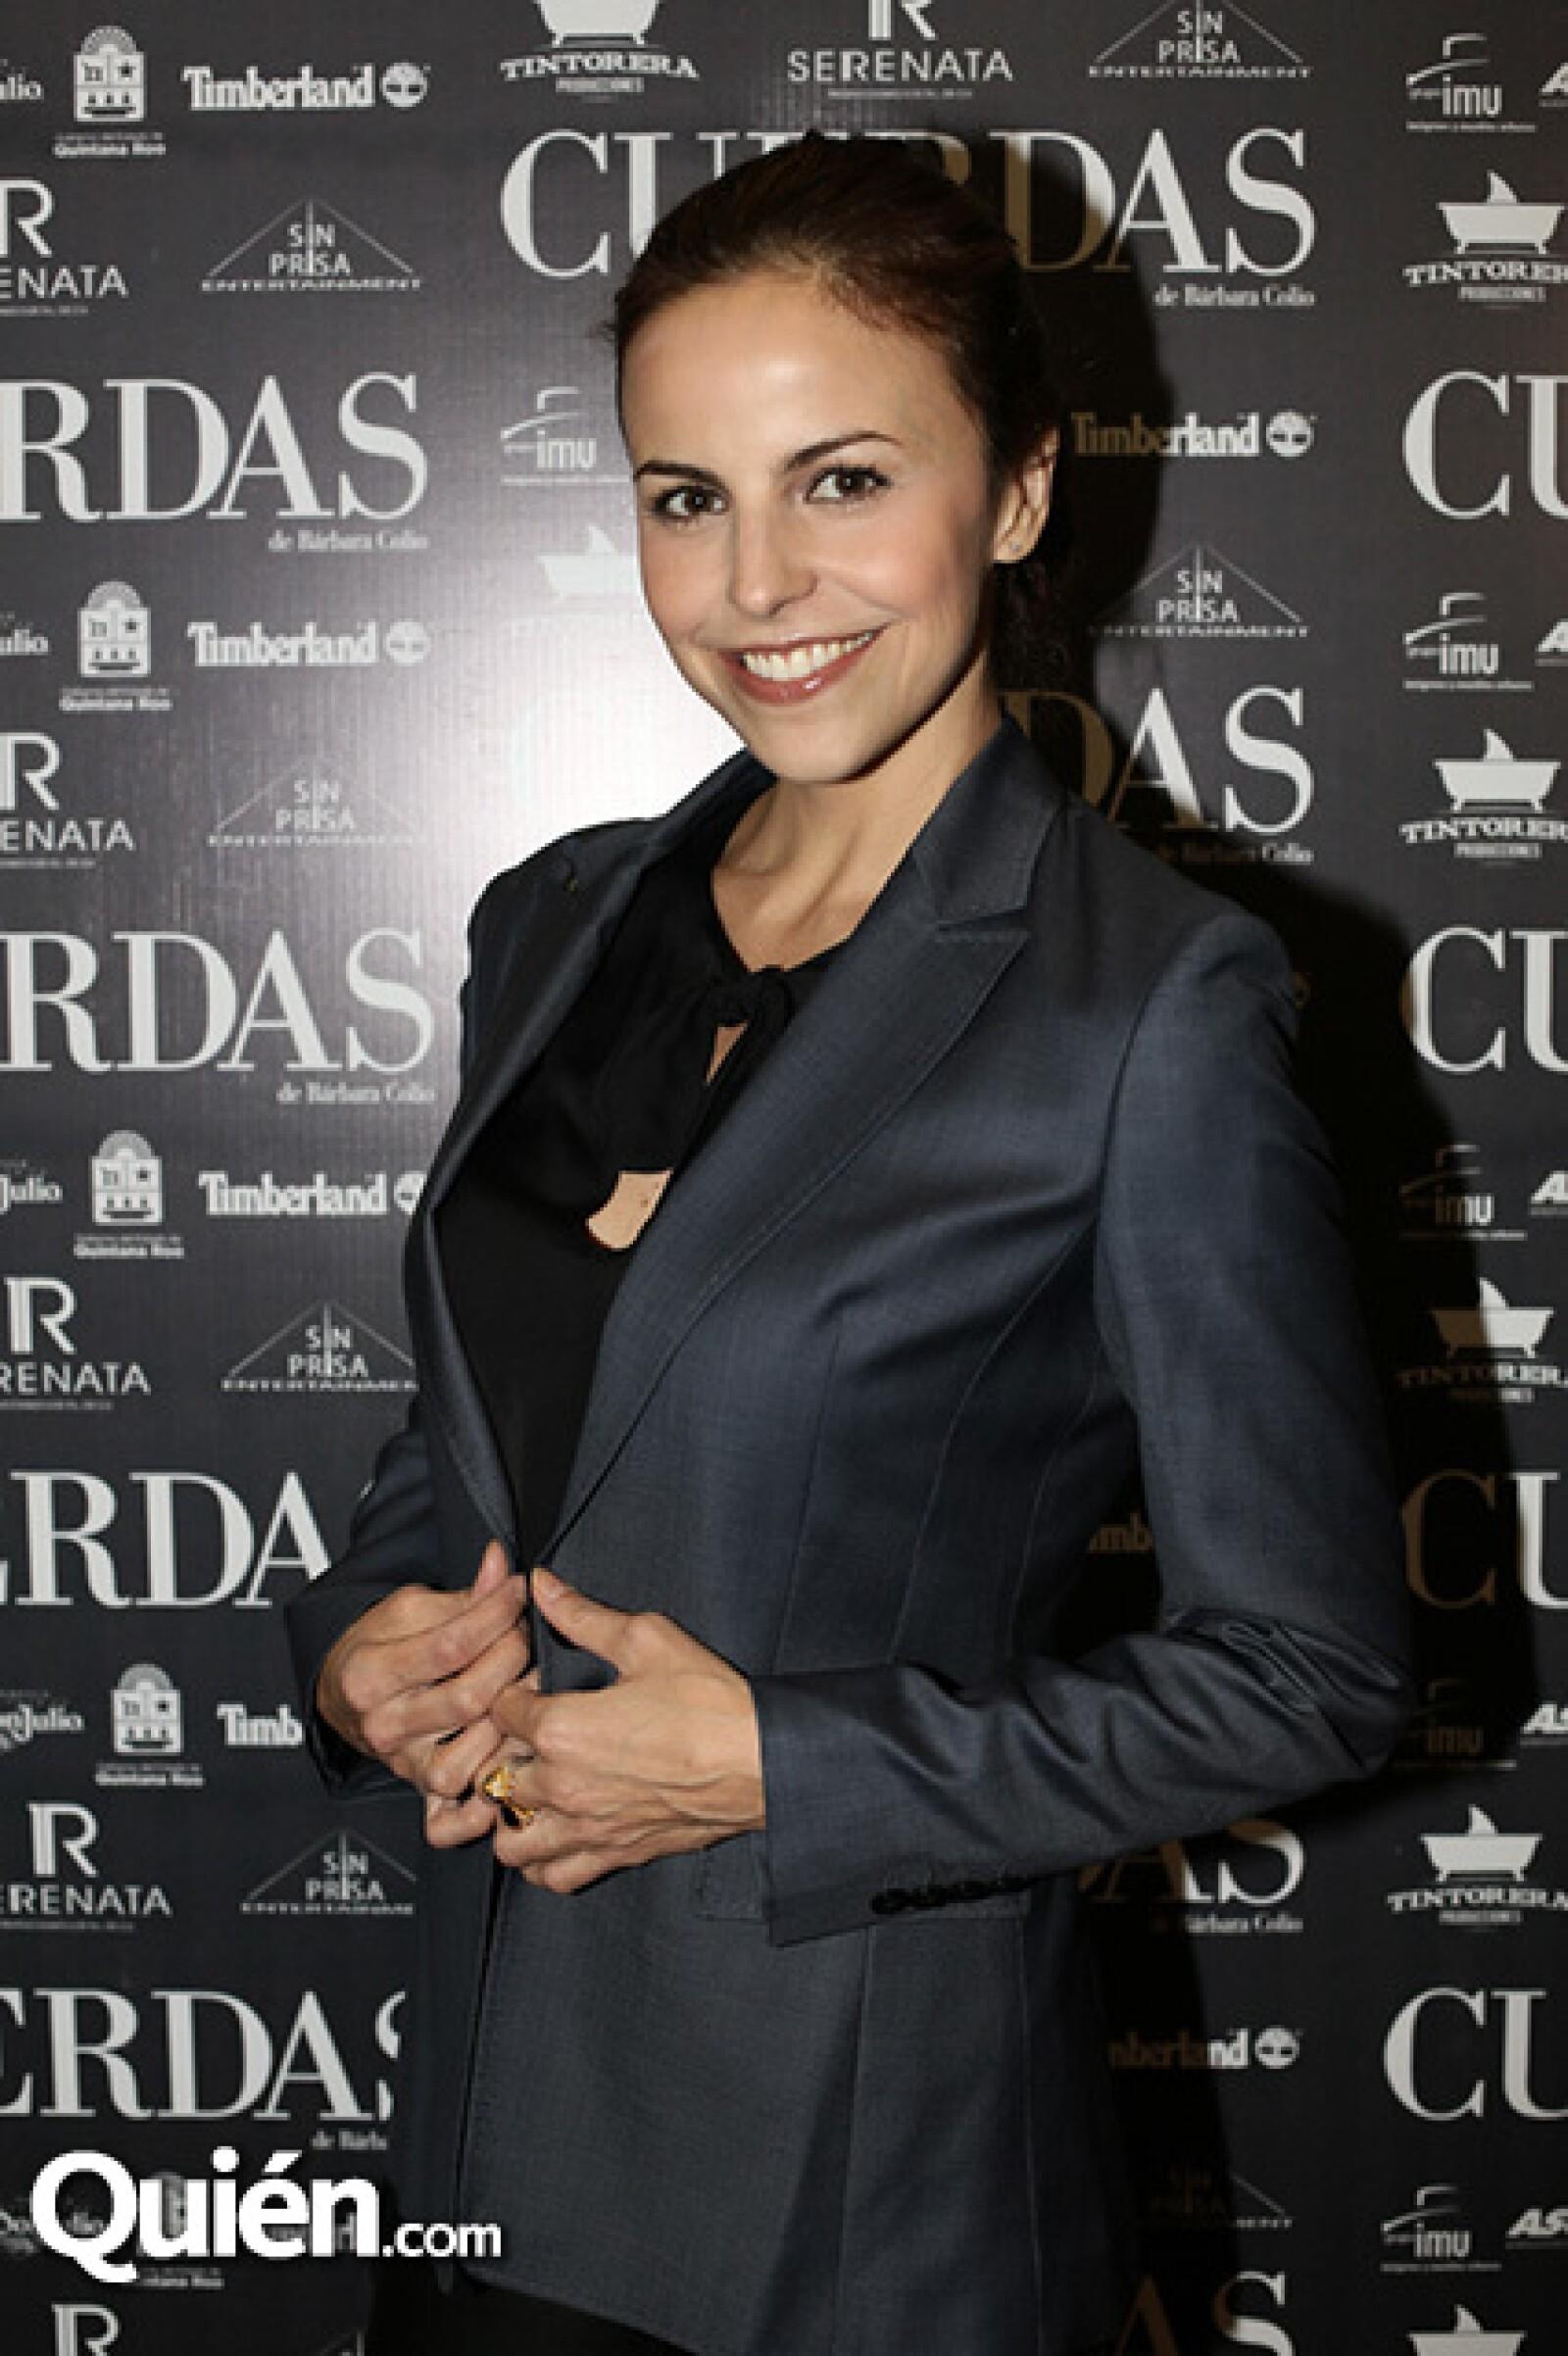 Alejandra Ambrosi